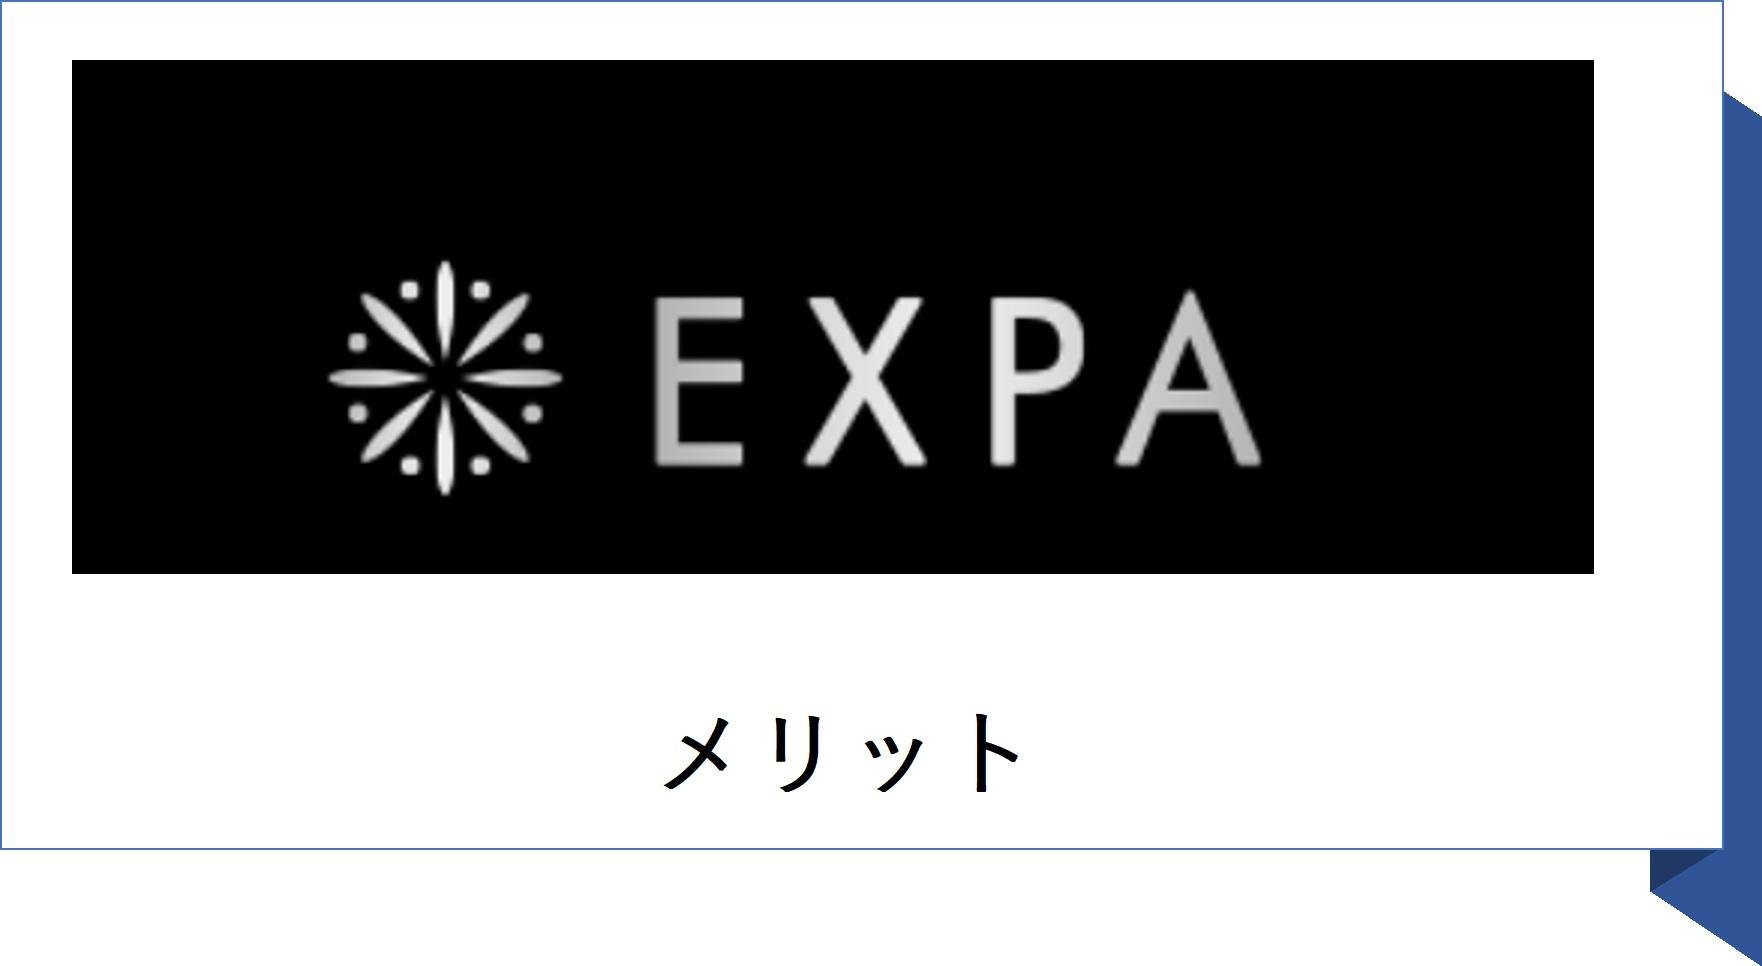 expa(メリット)